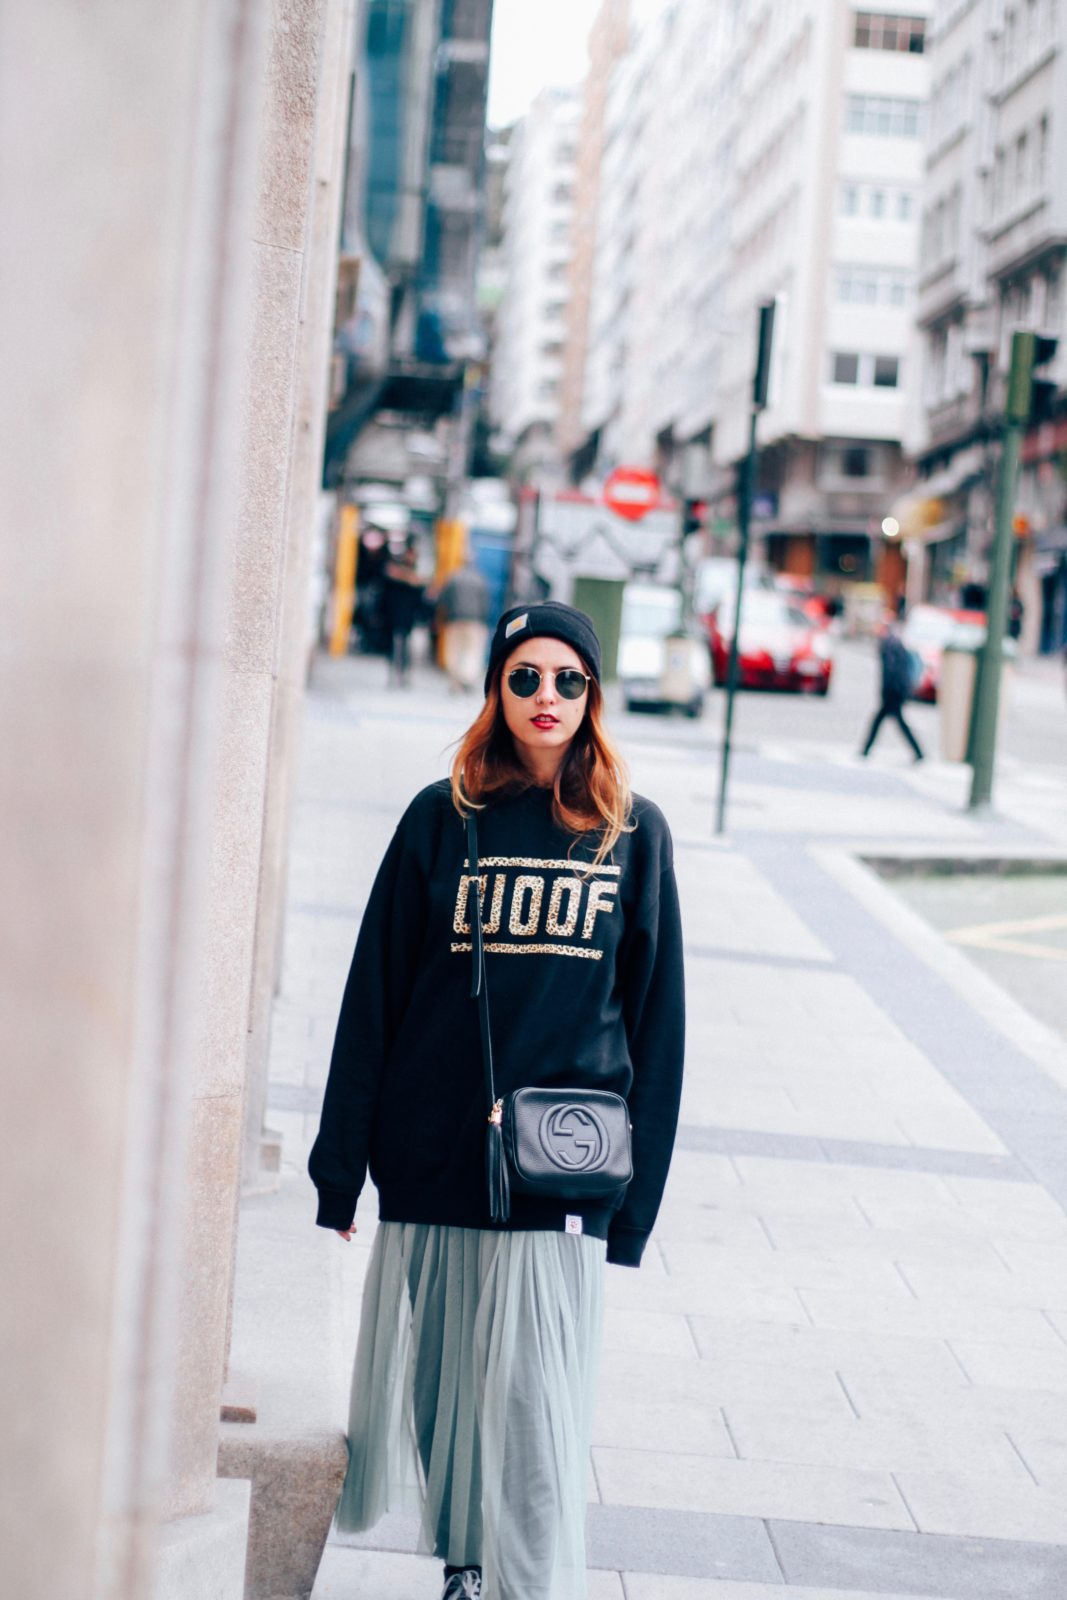 sudadera_old_dogs_falda_de_tul_vans_beanie_carhartt_look_donkeycool_street_style-40